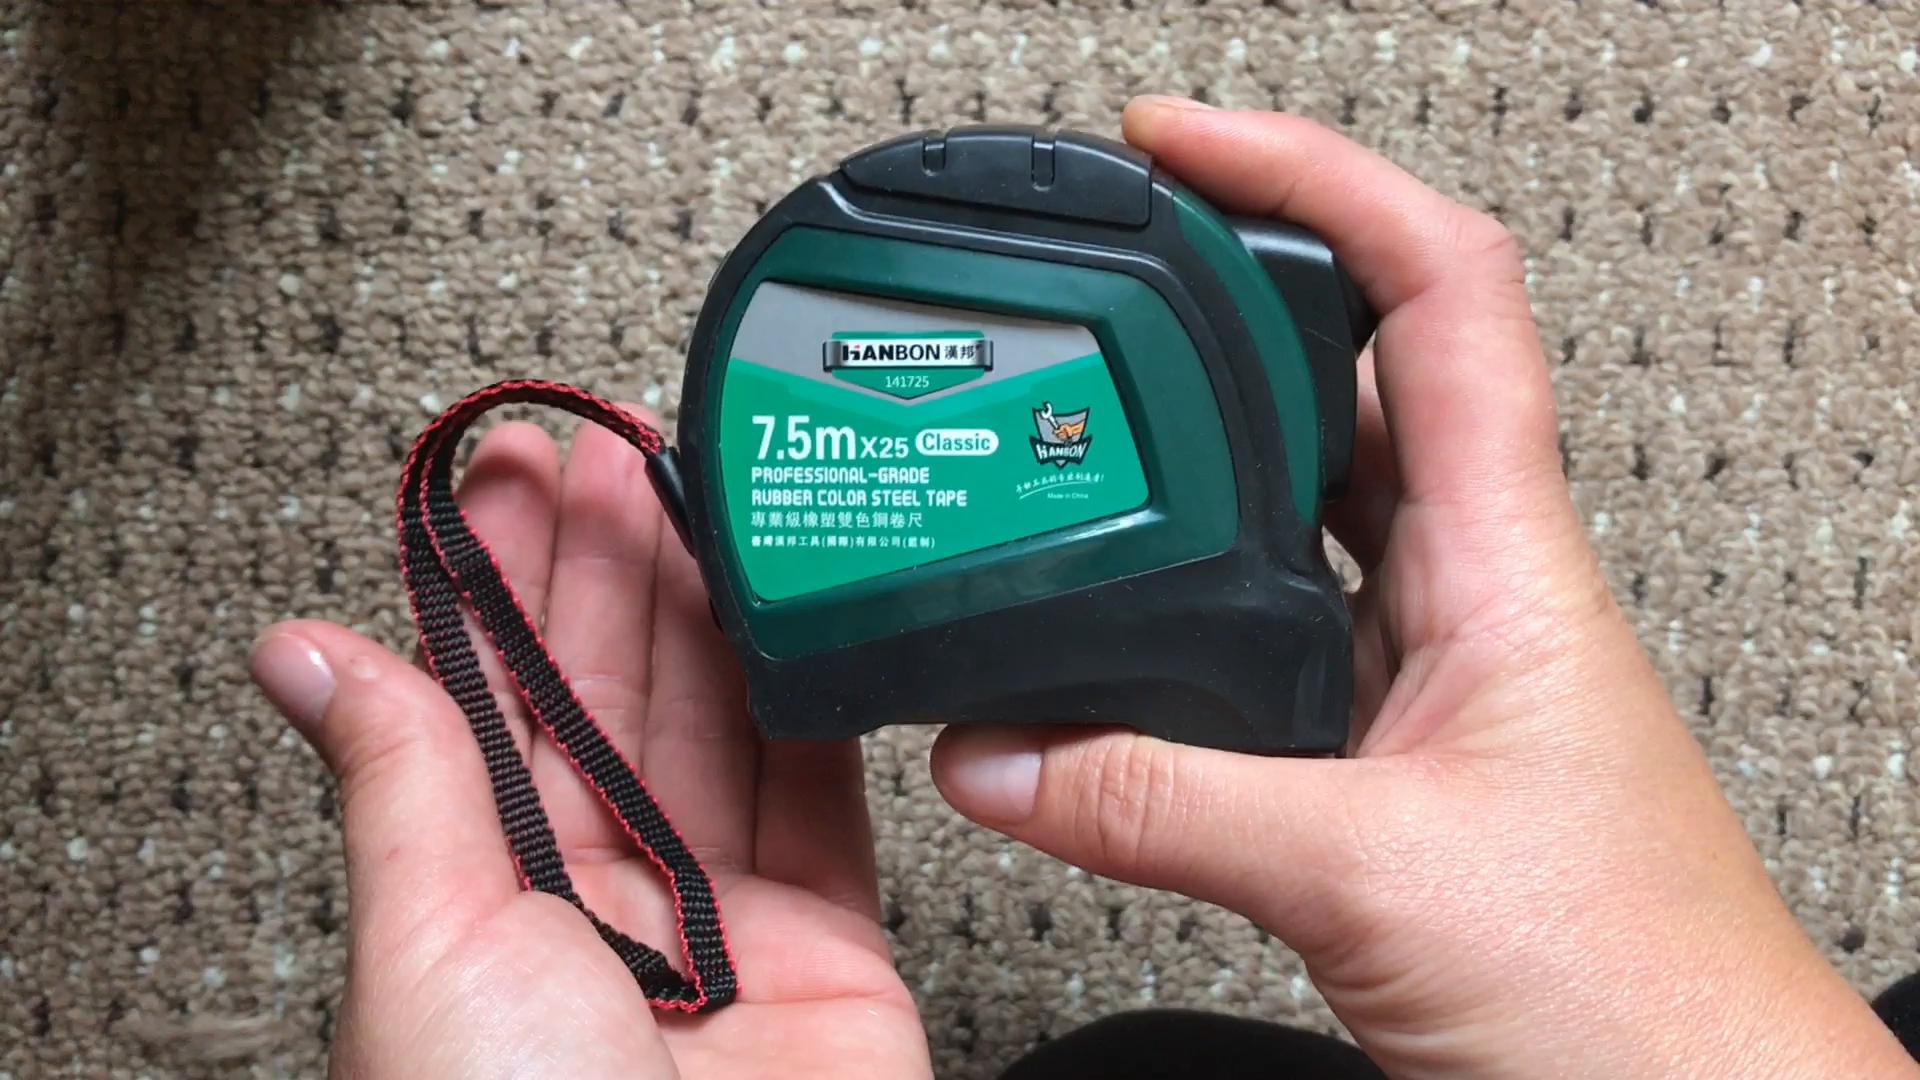 Tape Measure Measuring Tape Uktunu 7.5m Metric Prime Double Sided ...